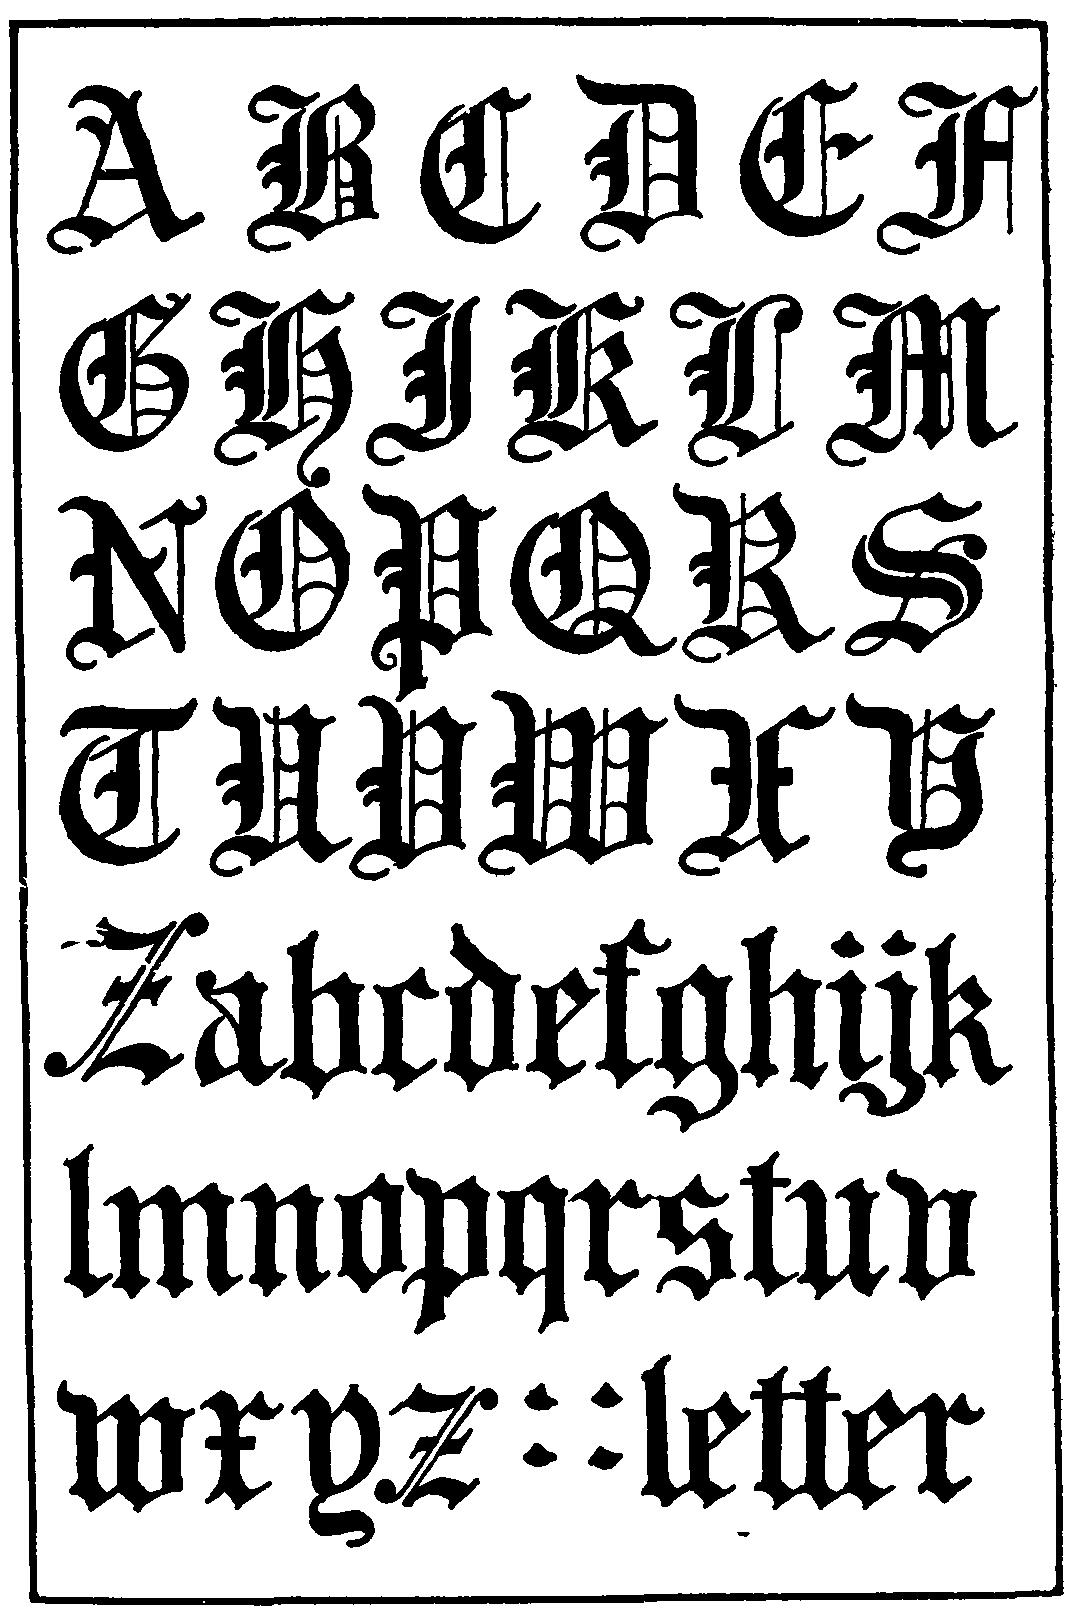 15 Century Gothic Font Alphabet Images